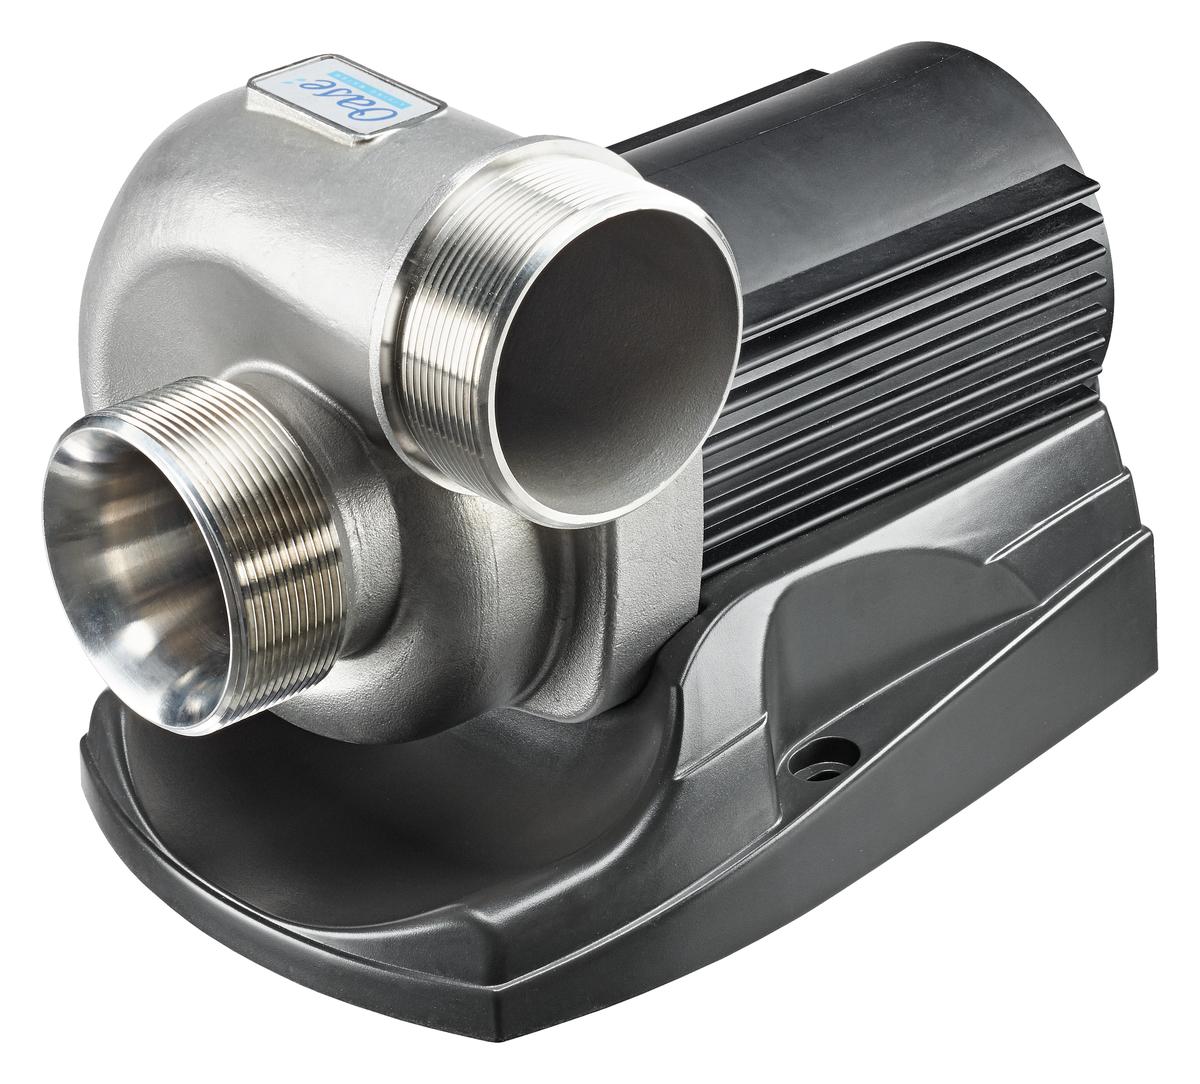 FOT_PRD_FREI_FRRE_47028-AquaMax-Eco-Titanium-30000-007_-SALL_-AINJPG_-V1